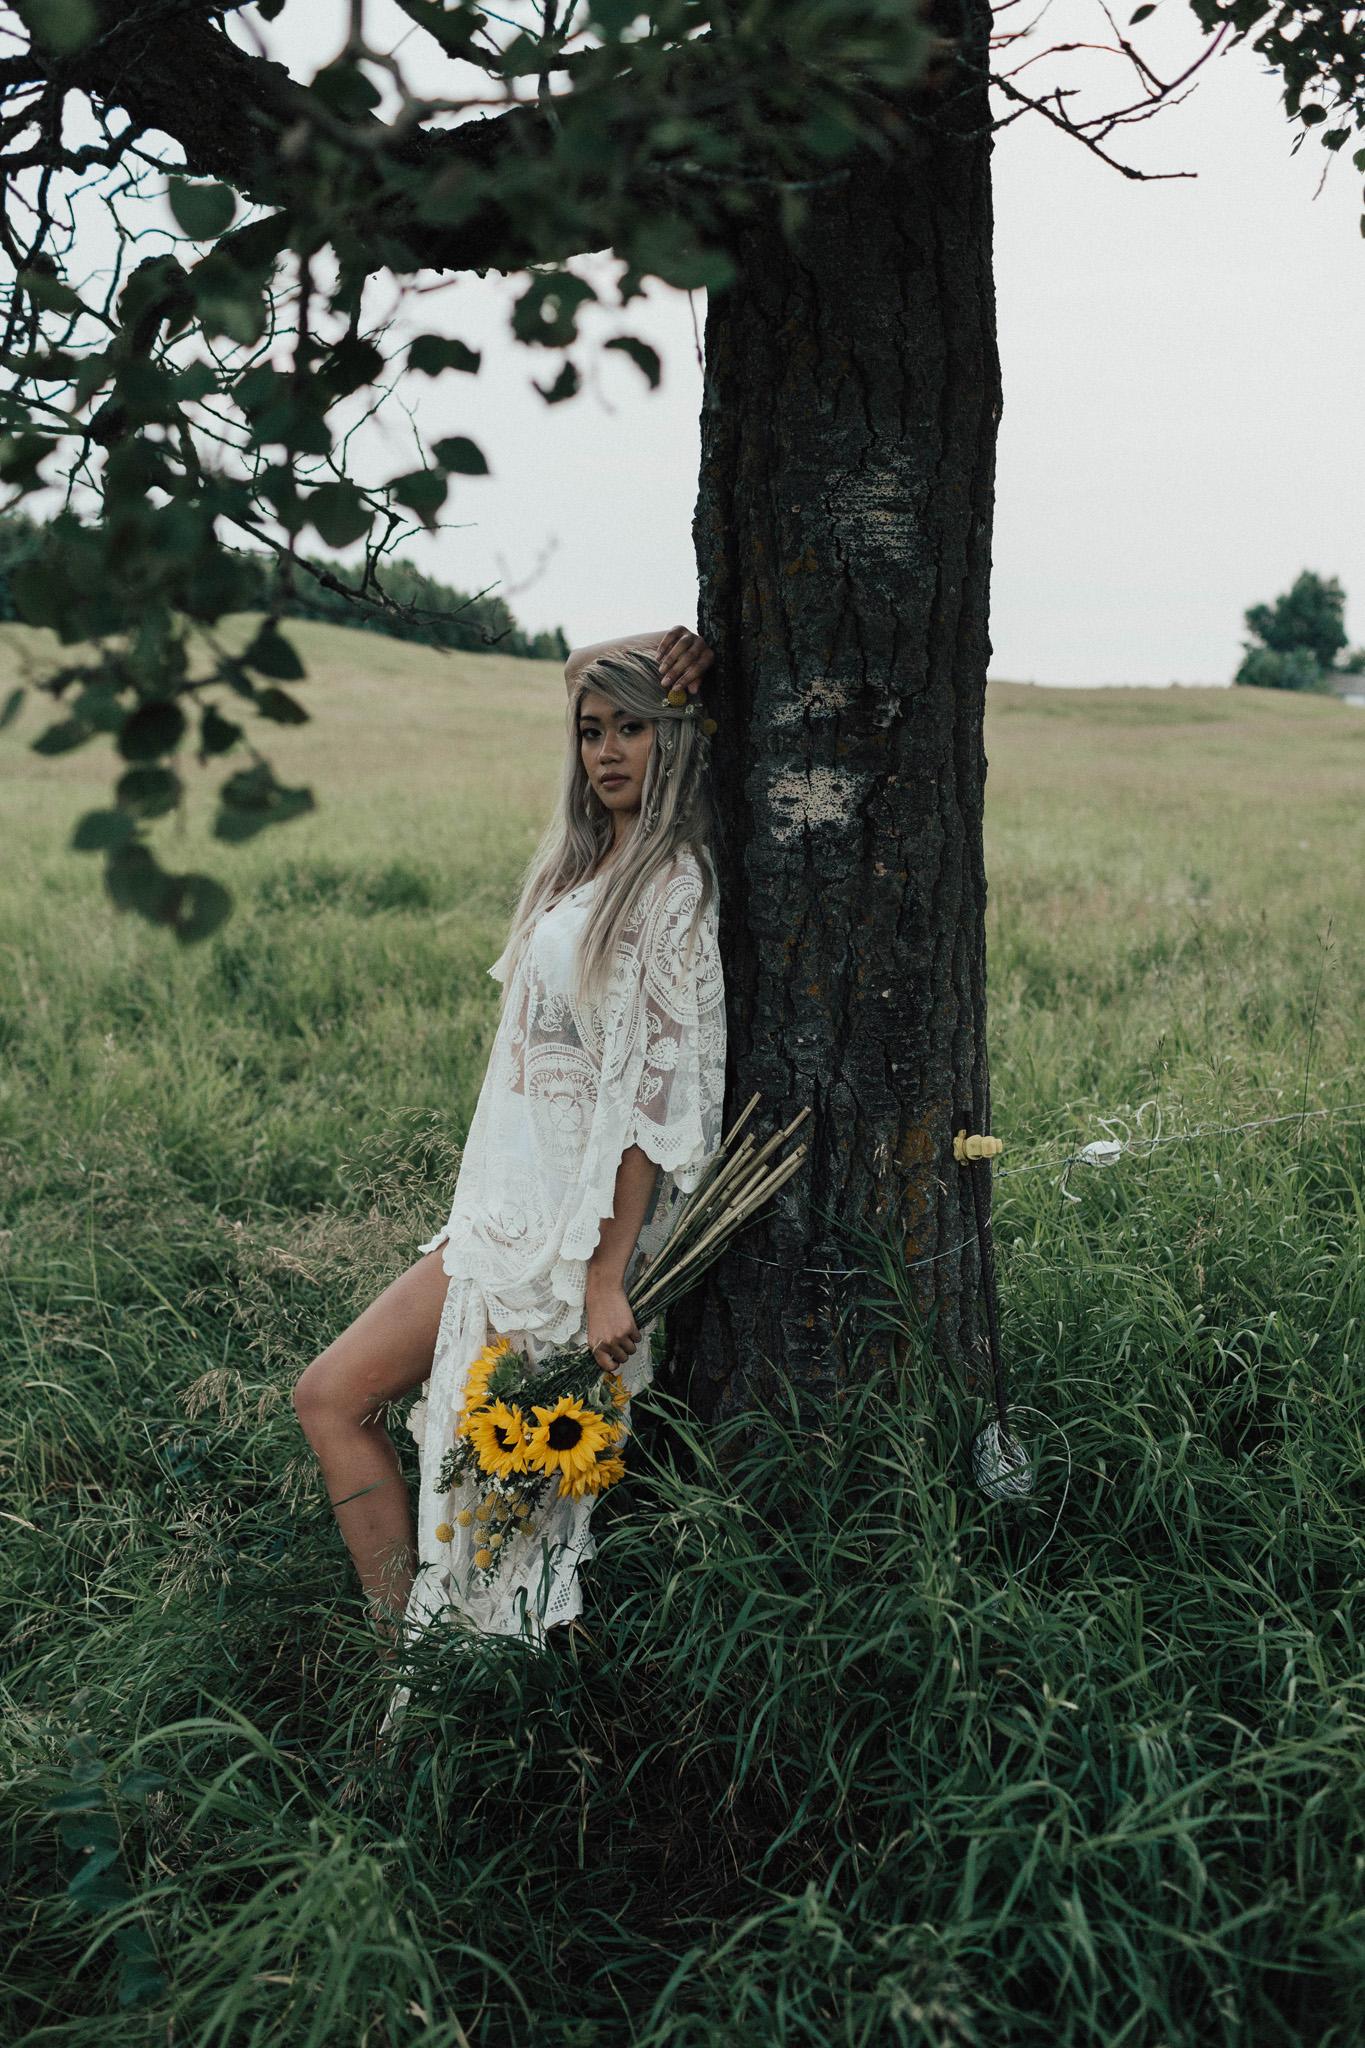 gypsy boler boudoir session - michelle larmand 056